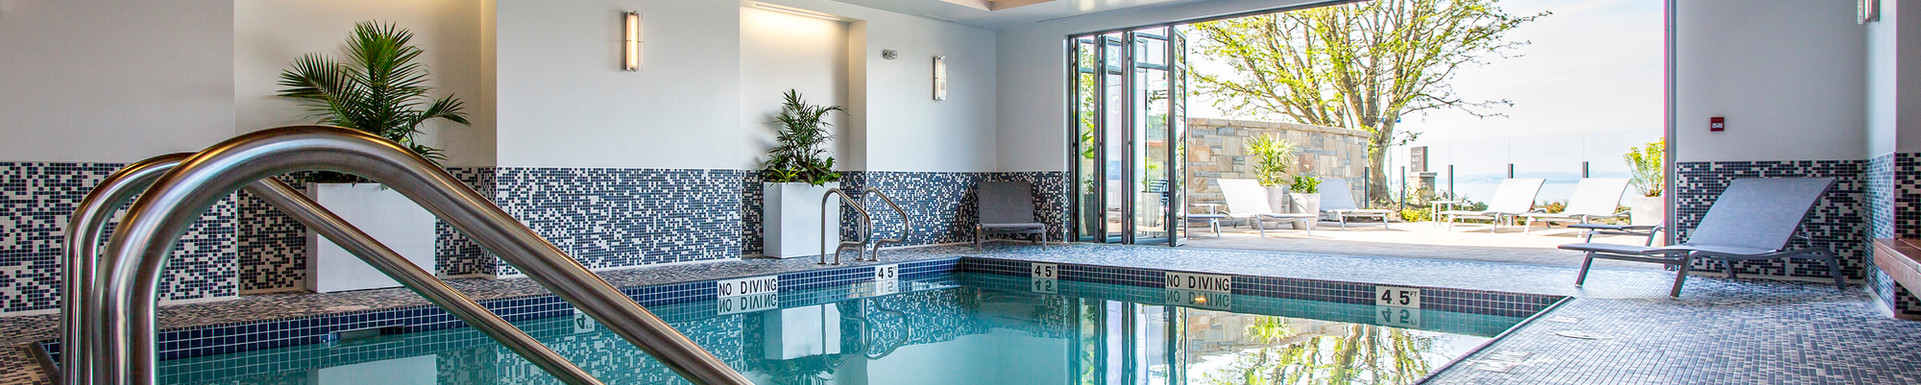 QBI Indoor Pool